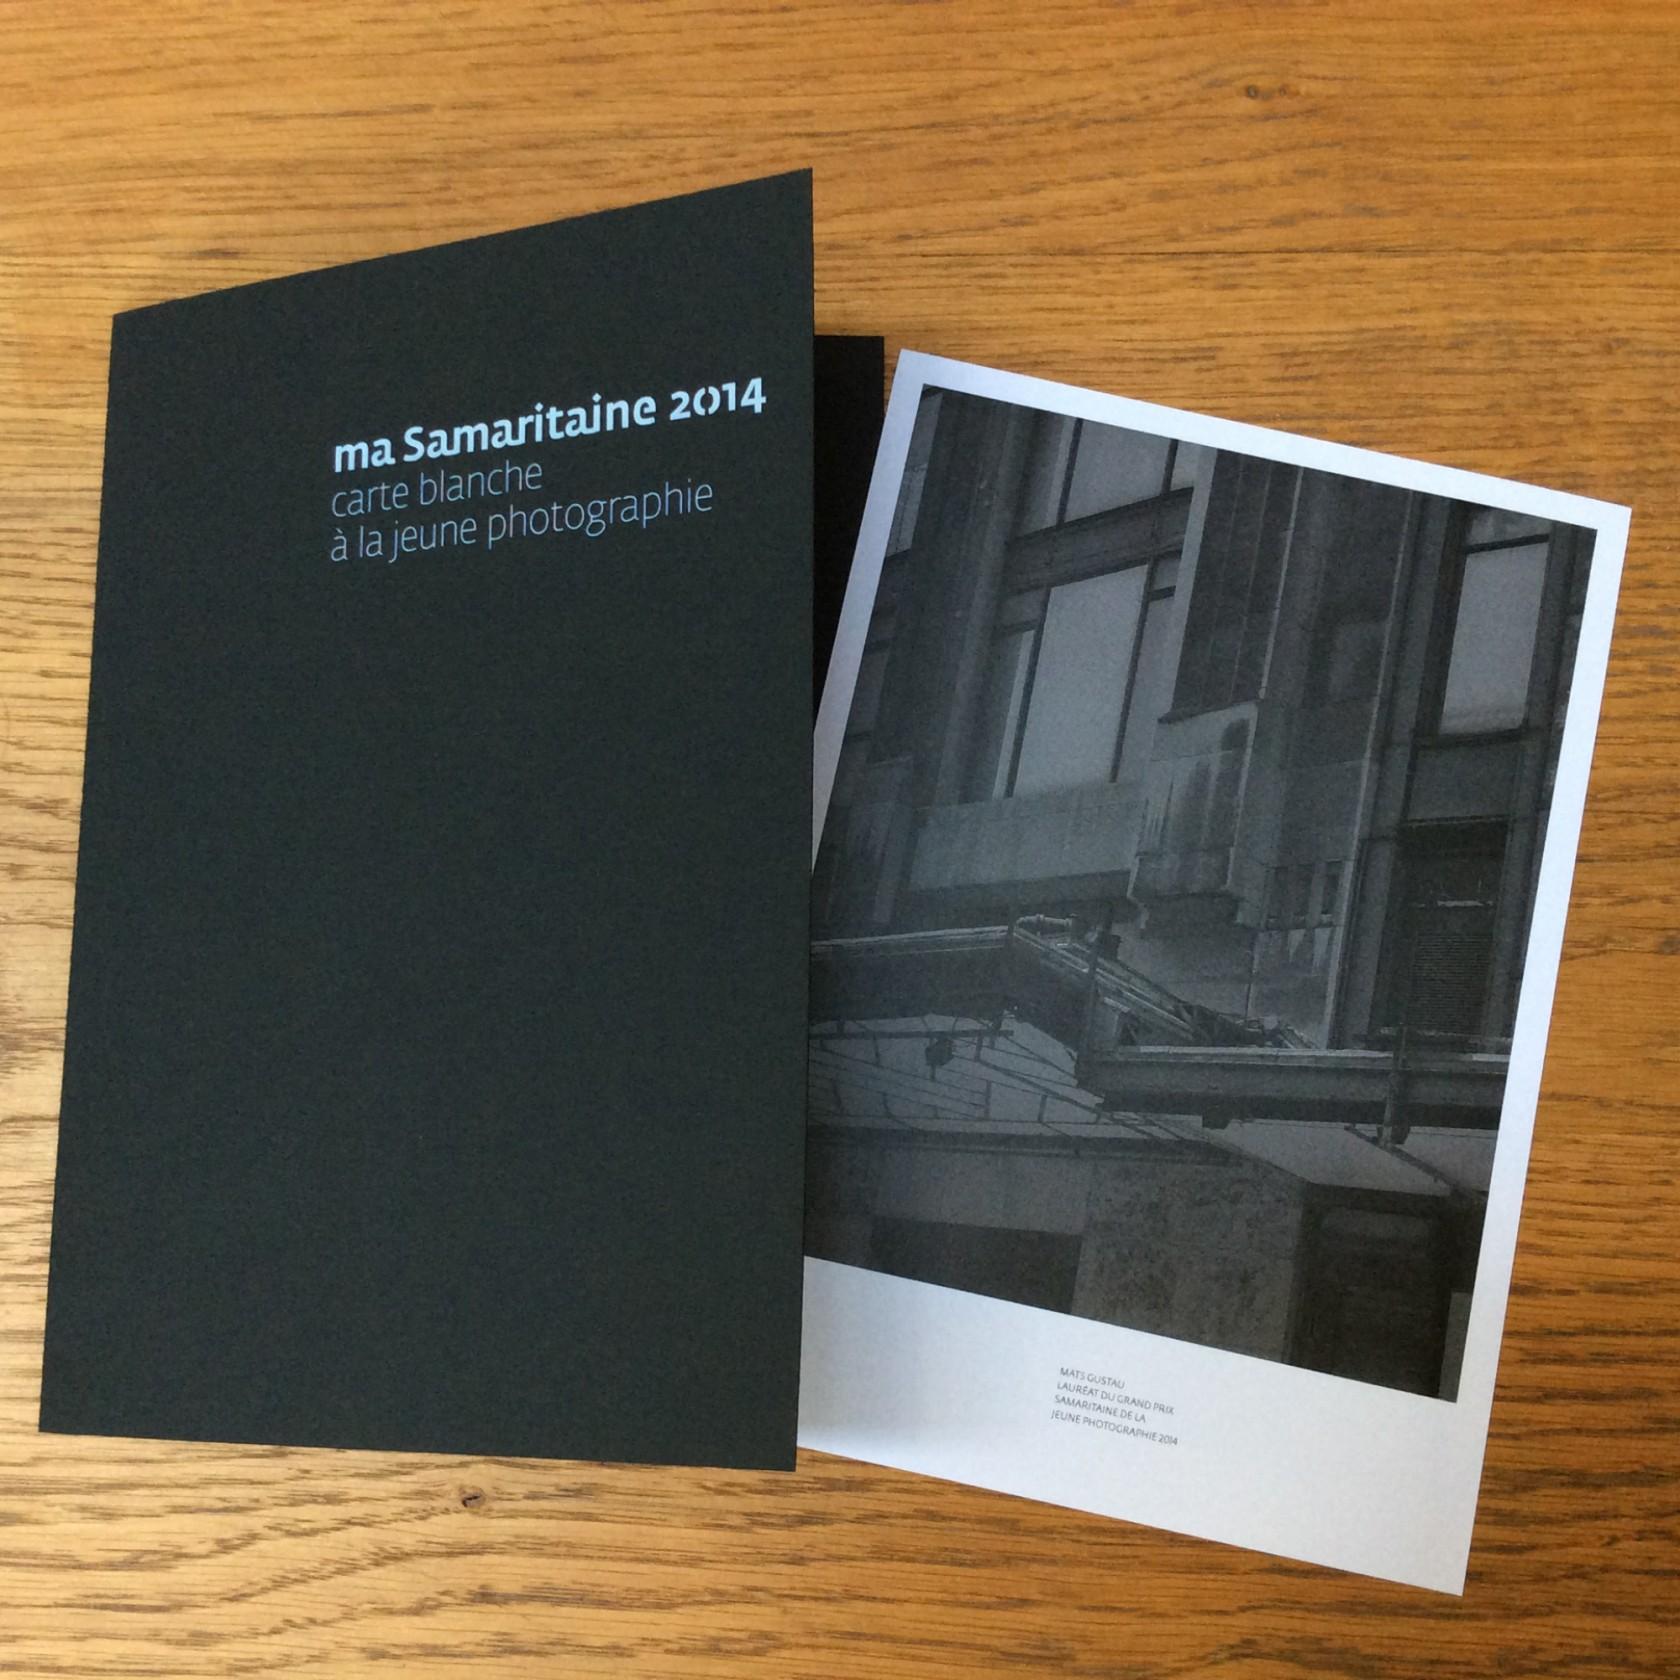 fouinzanardi -  fz_print_rp_com_samaritaine12